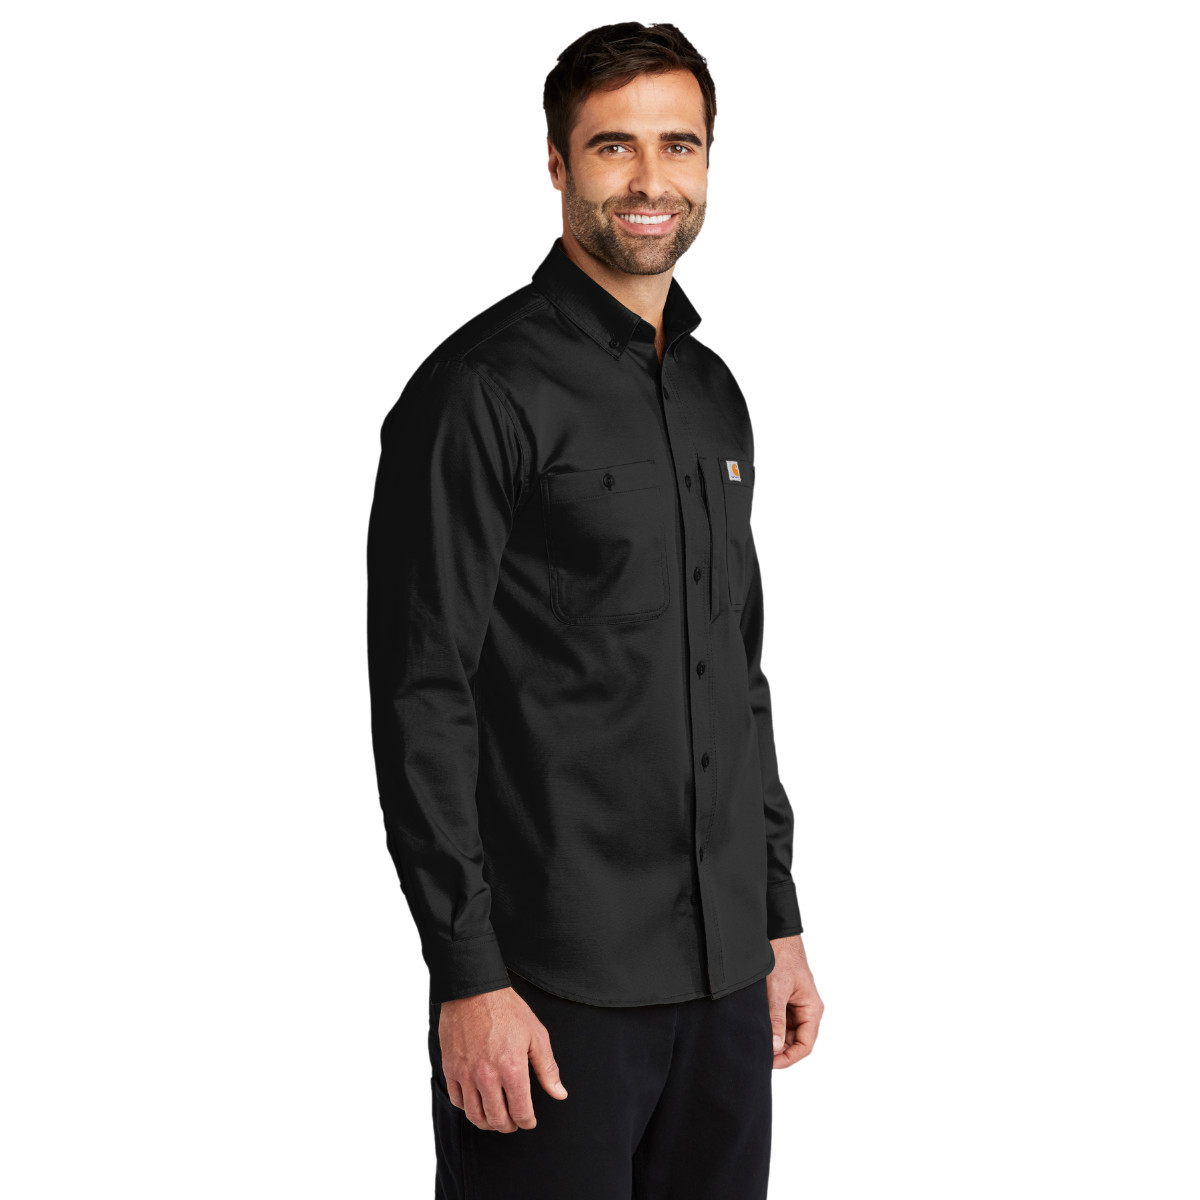 Carhartt® Rugged Professional™ Series Long Sleeve Shirt